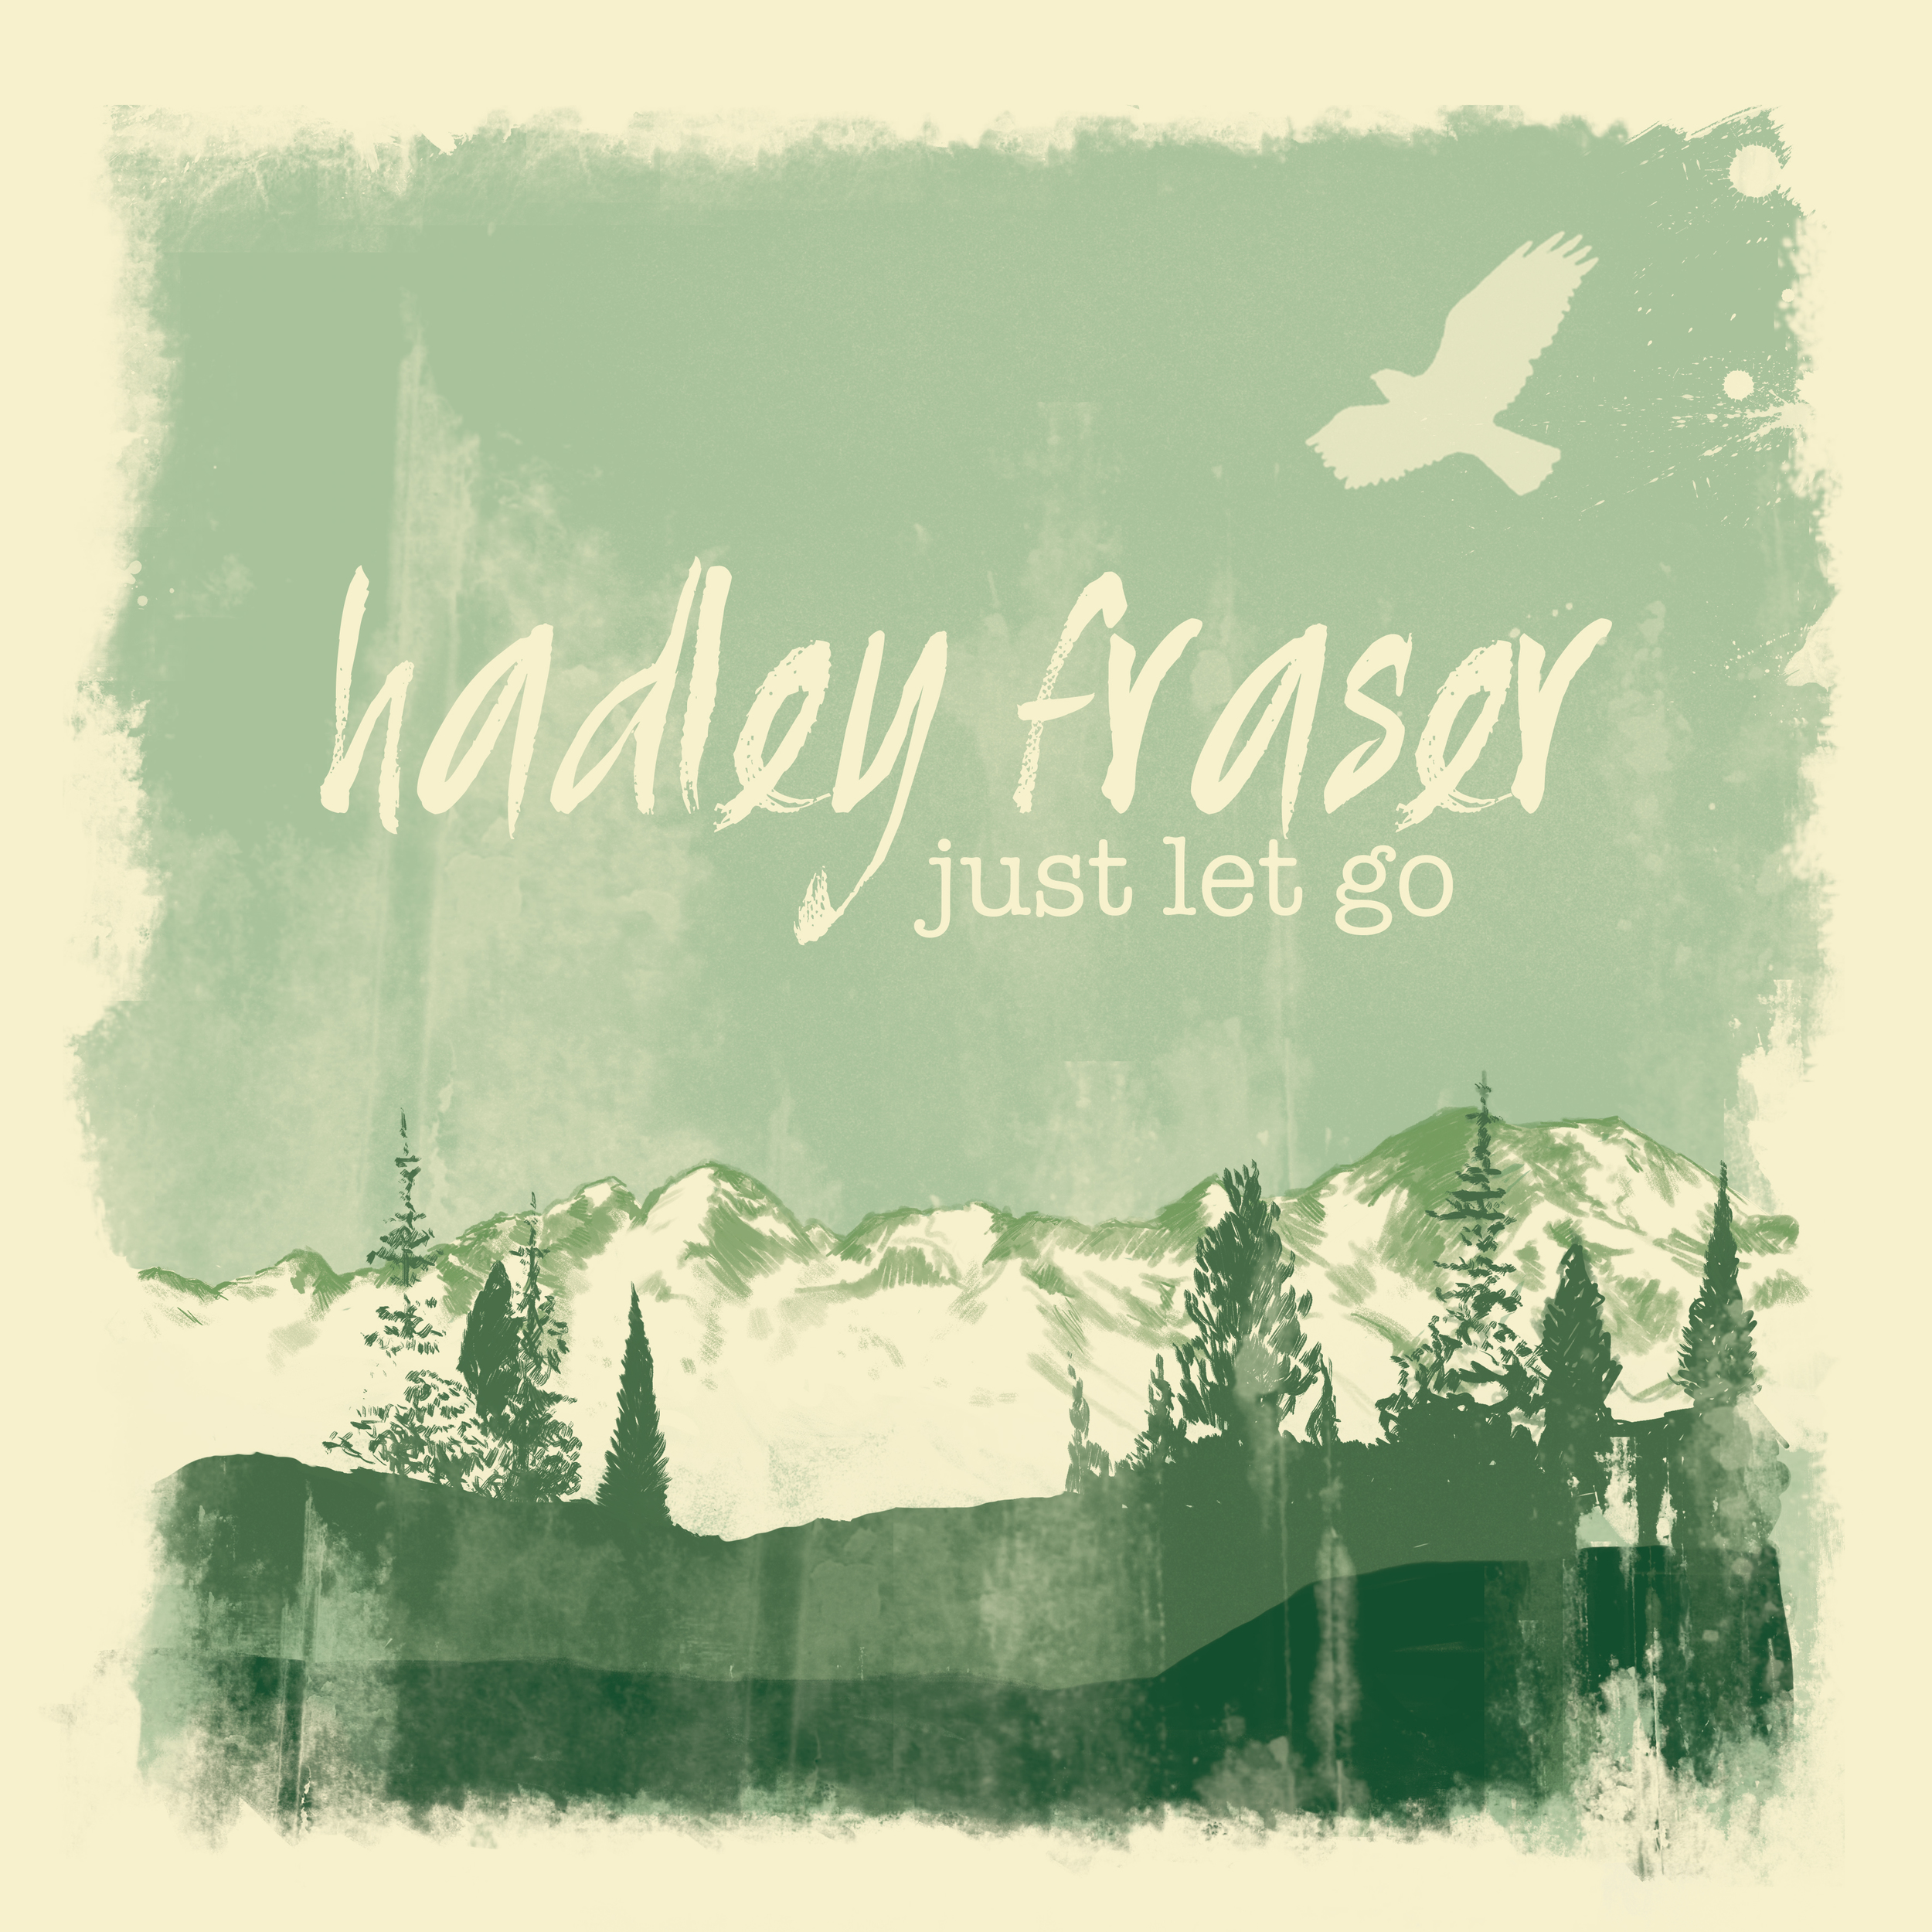 Hadley Fraser EP Artwork  https://hadleyfraser.bandcamp.com/releases